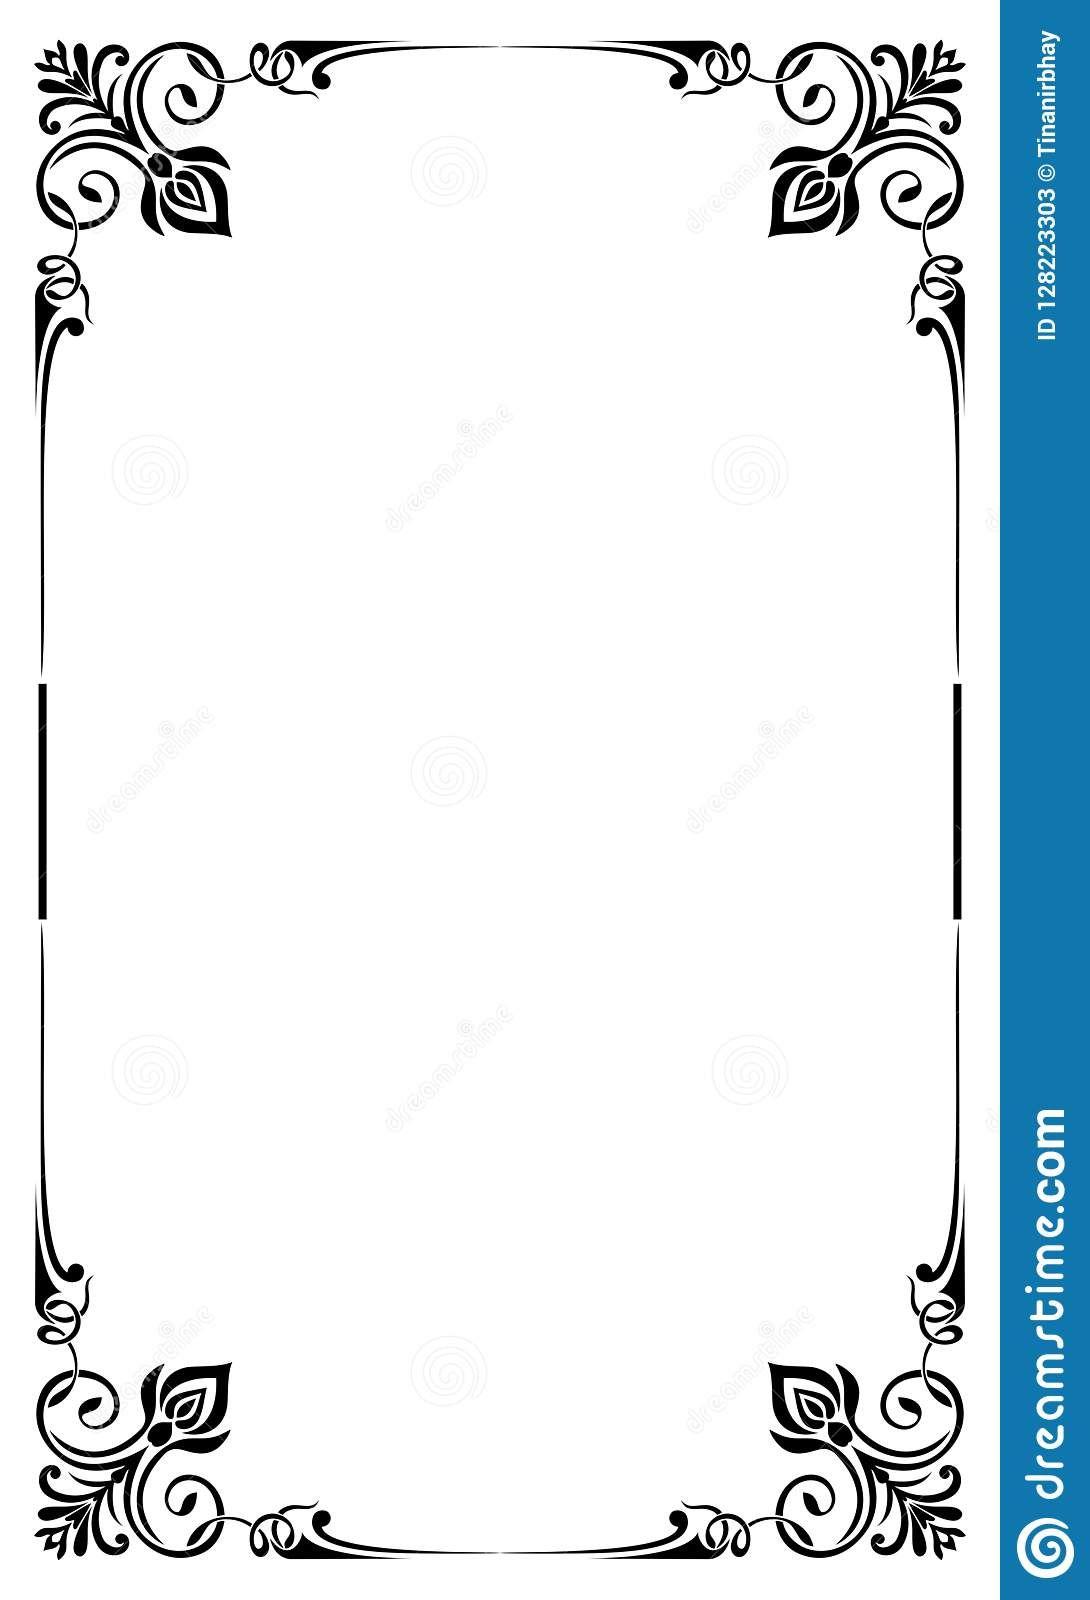 The Cool Restaurant Menu Card Frame Template Stock Vector For Blank Restaurant Menu Template Pics Belo Restaurant Menu Card Restaurant Menu Template Menu Cards